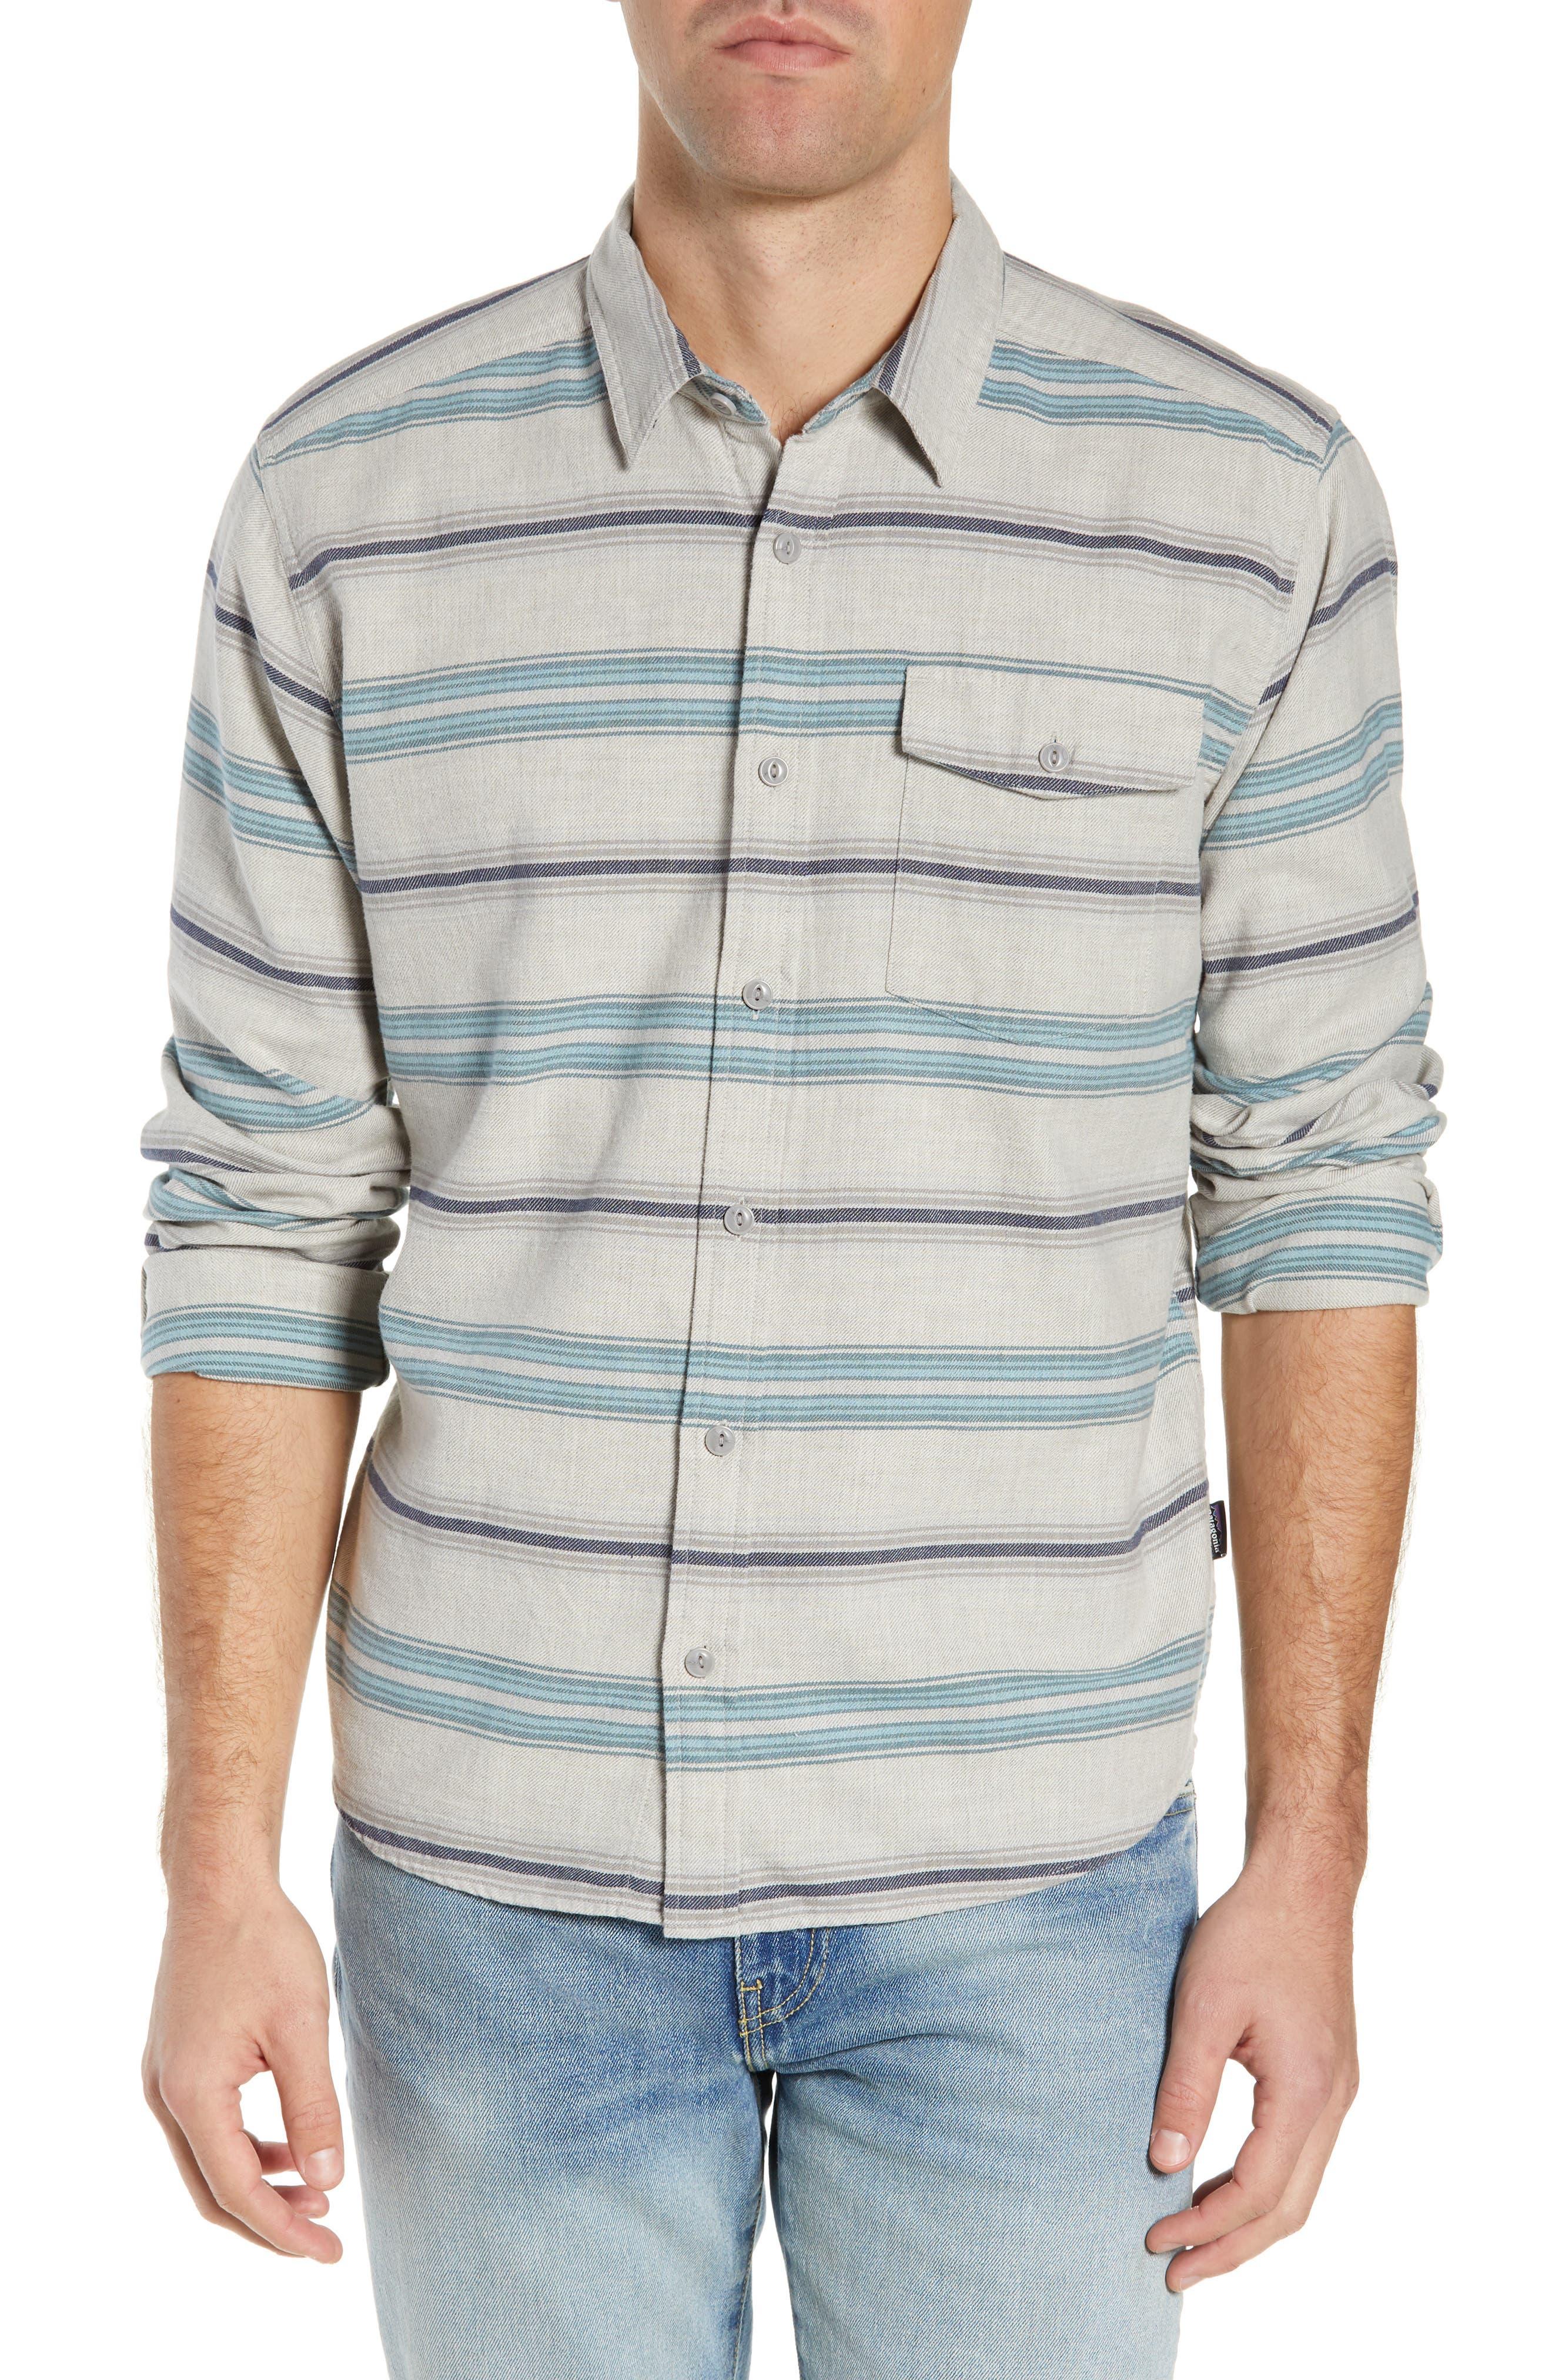 Patagonia Regular Fit Organic Cotton Flannel Shirt, Grey